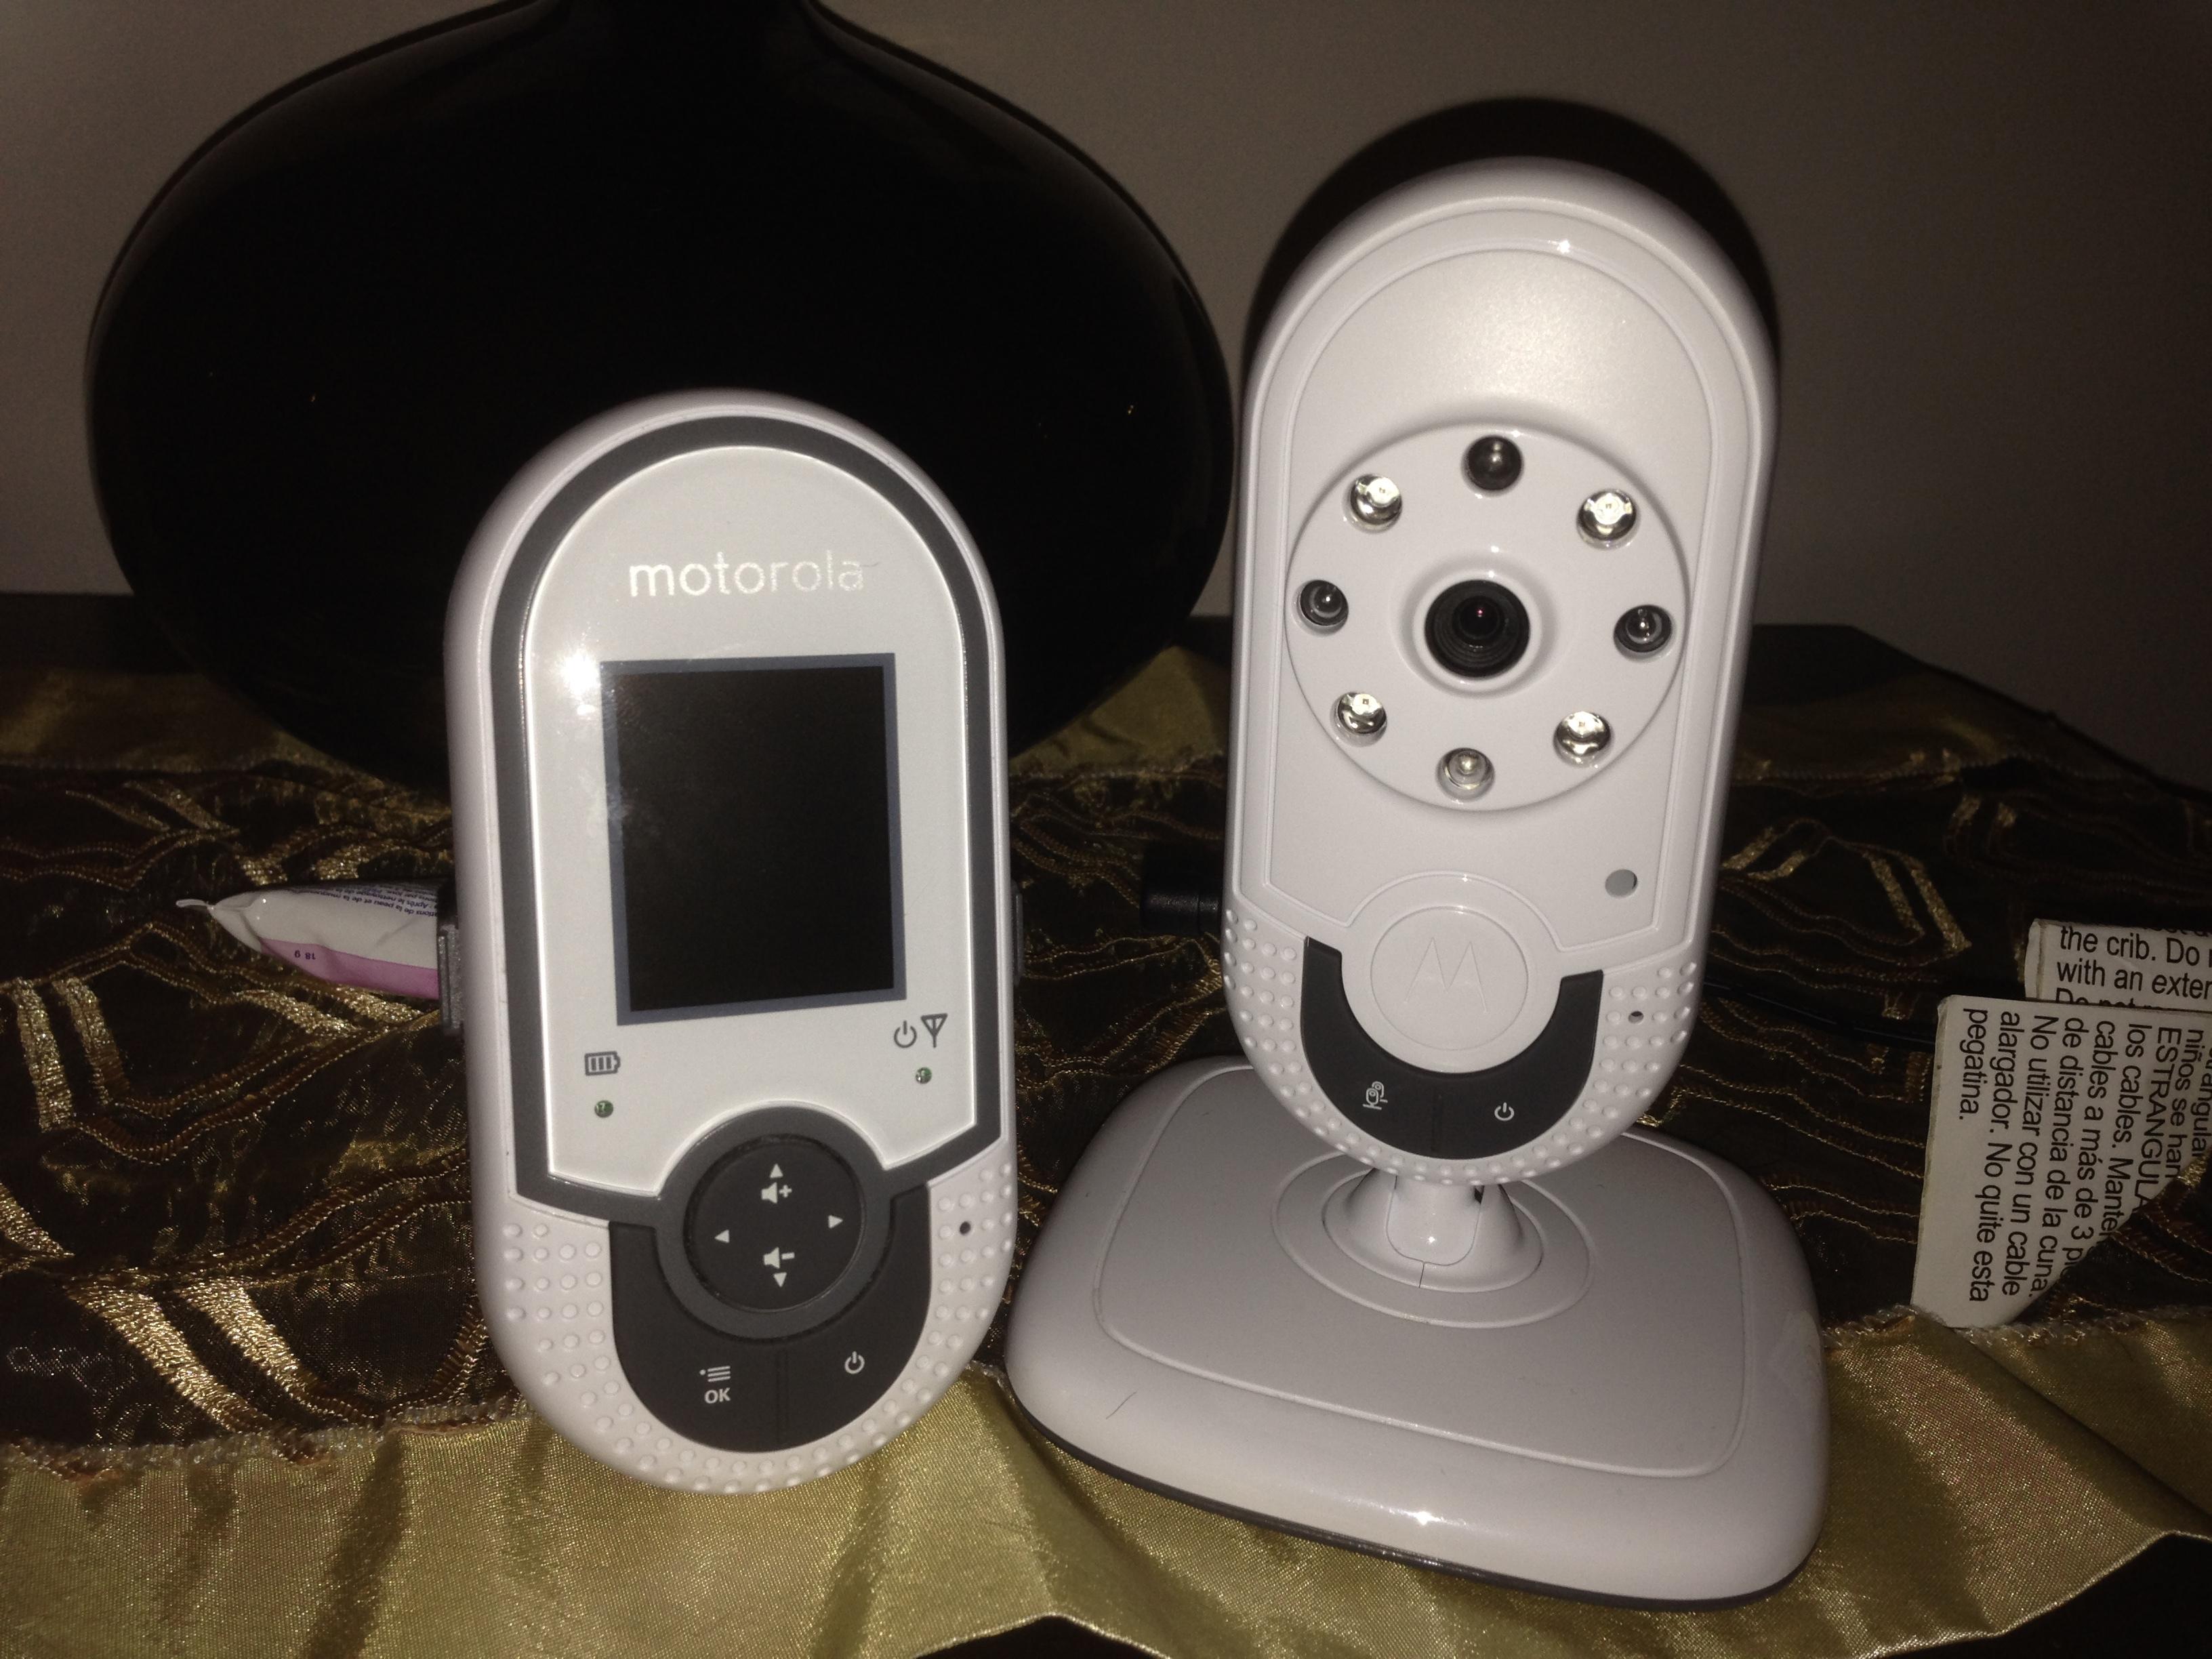 motorola digital video baby monitor reviews in baby accessories monitors. Black Bedroom Furniture Sets. Home Design Ideas